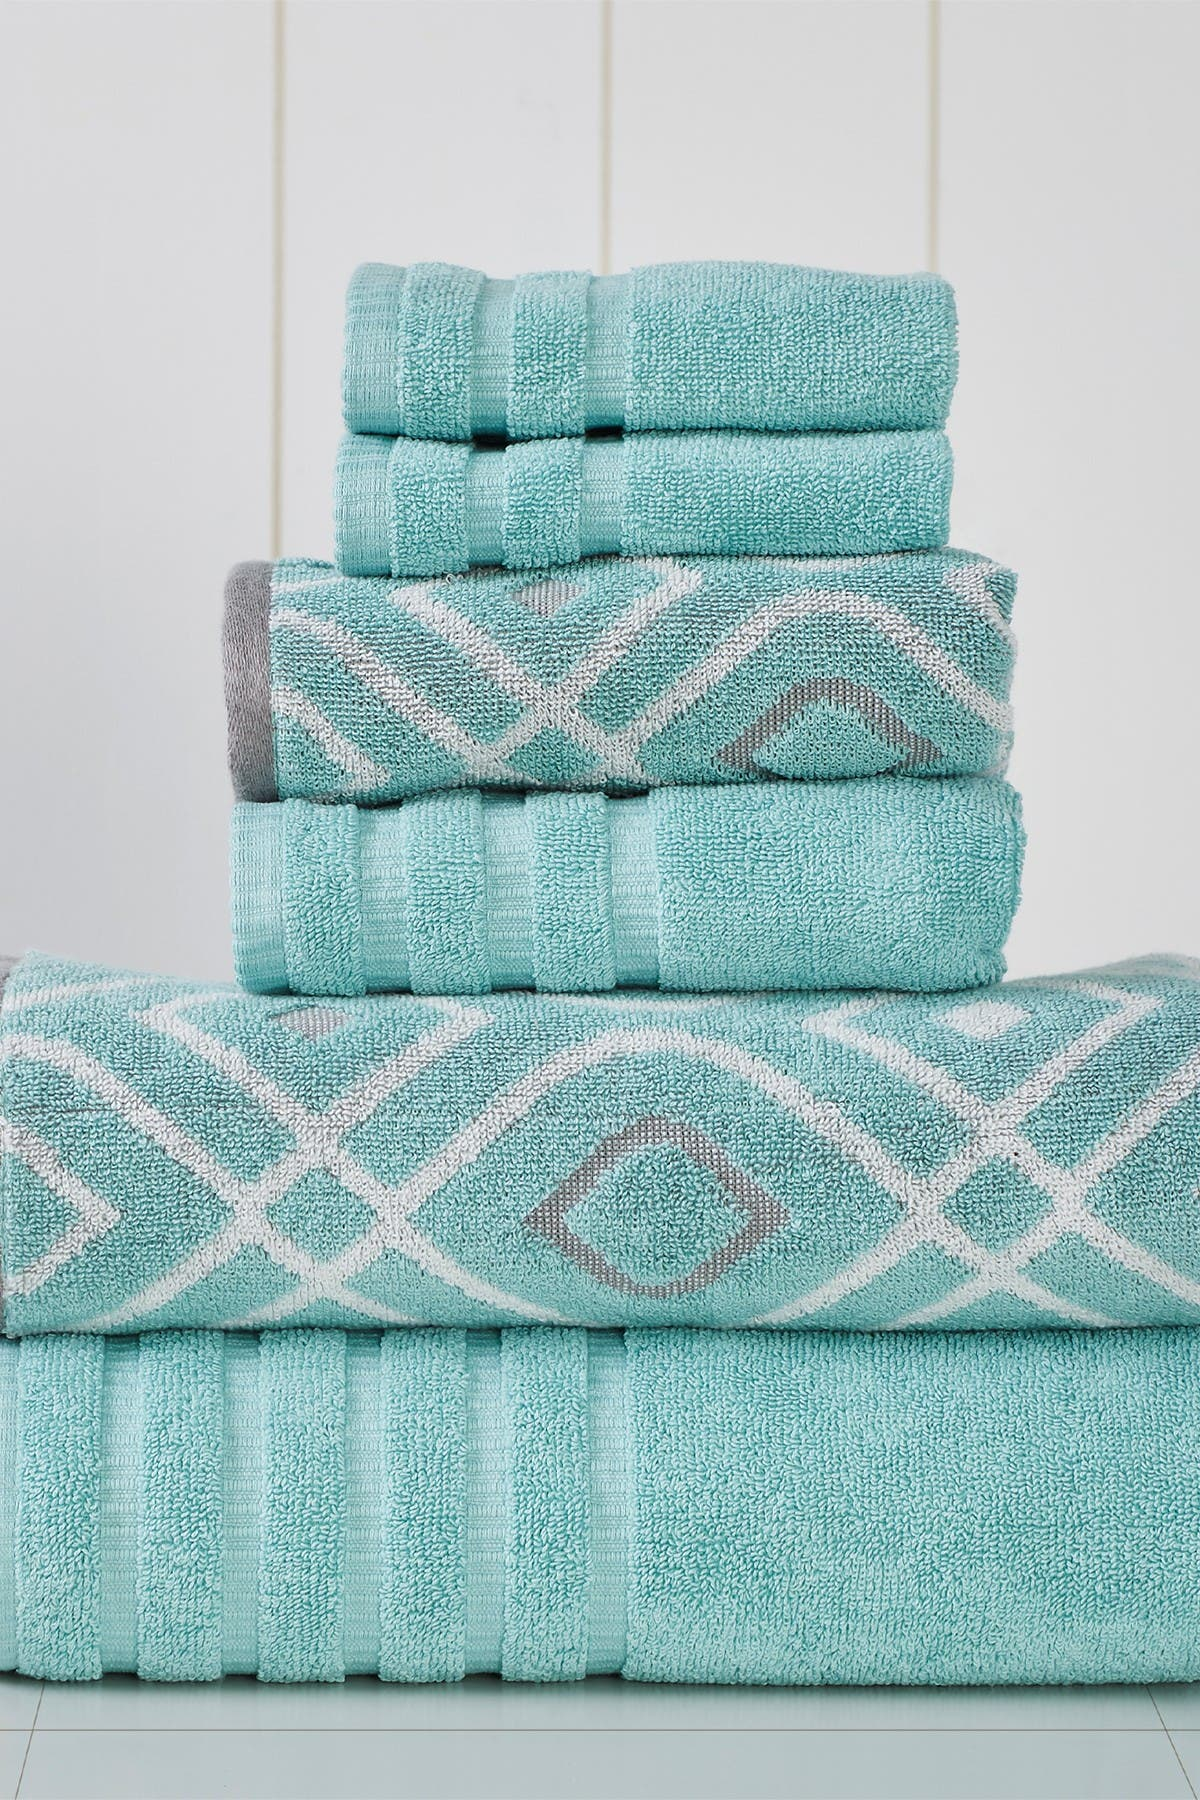 Image of Modern Threads Yard Dyed Towel 6-Piece Set - Oxford Aqua